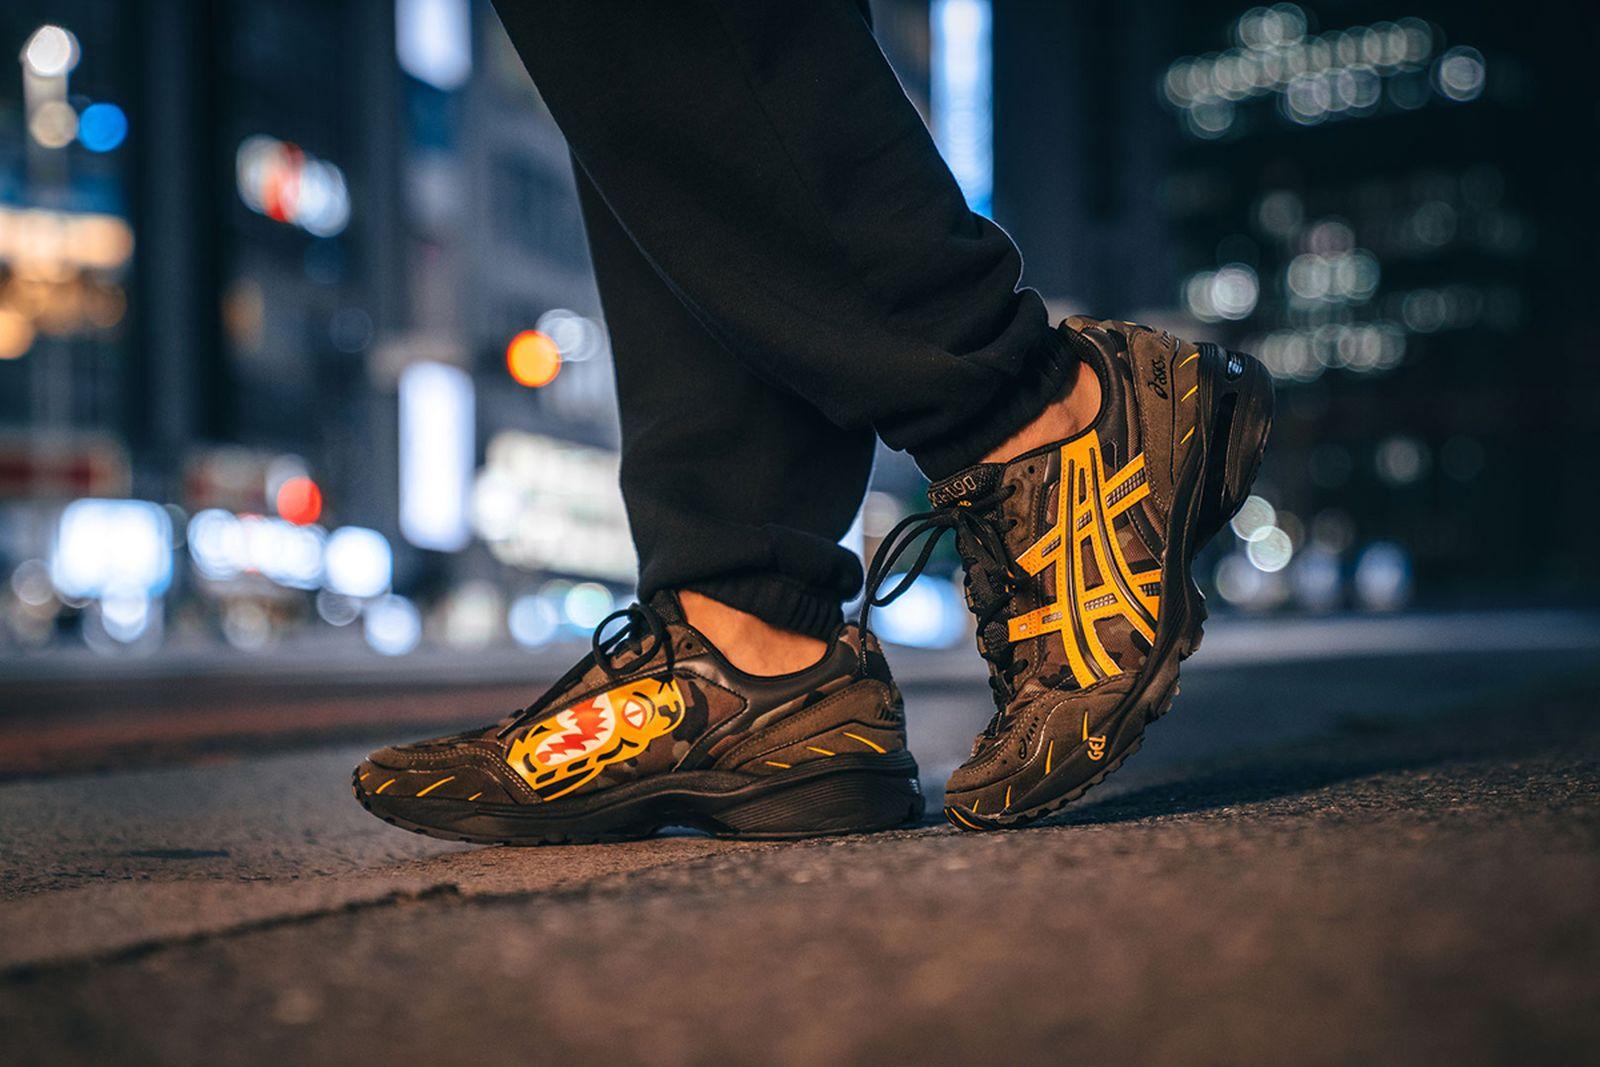 bape-asics-gel-1090-sneaker-collab-release-date-info-price-buy- (3)